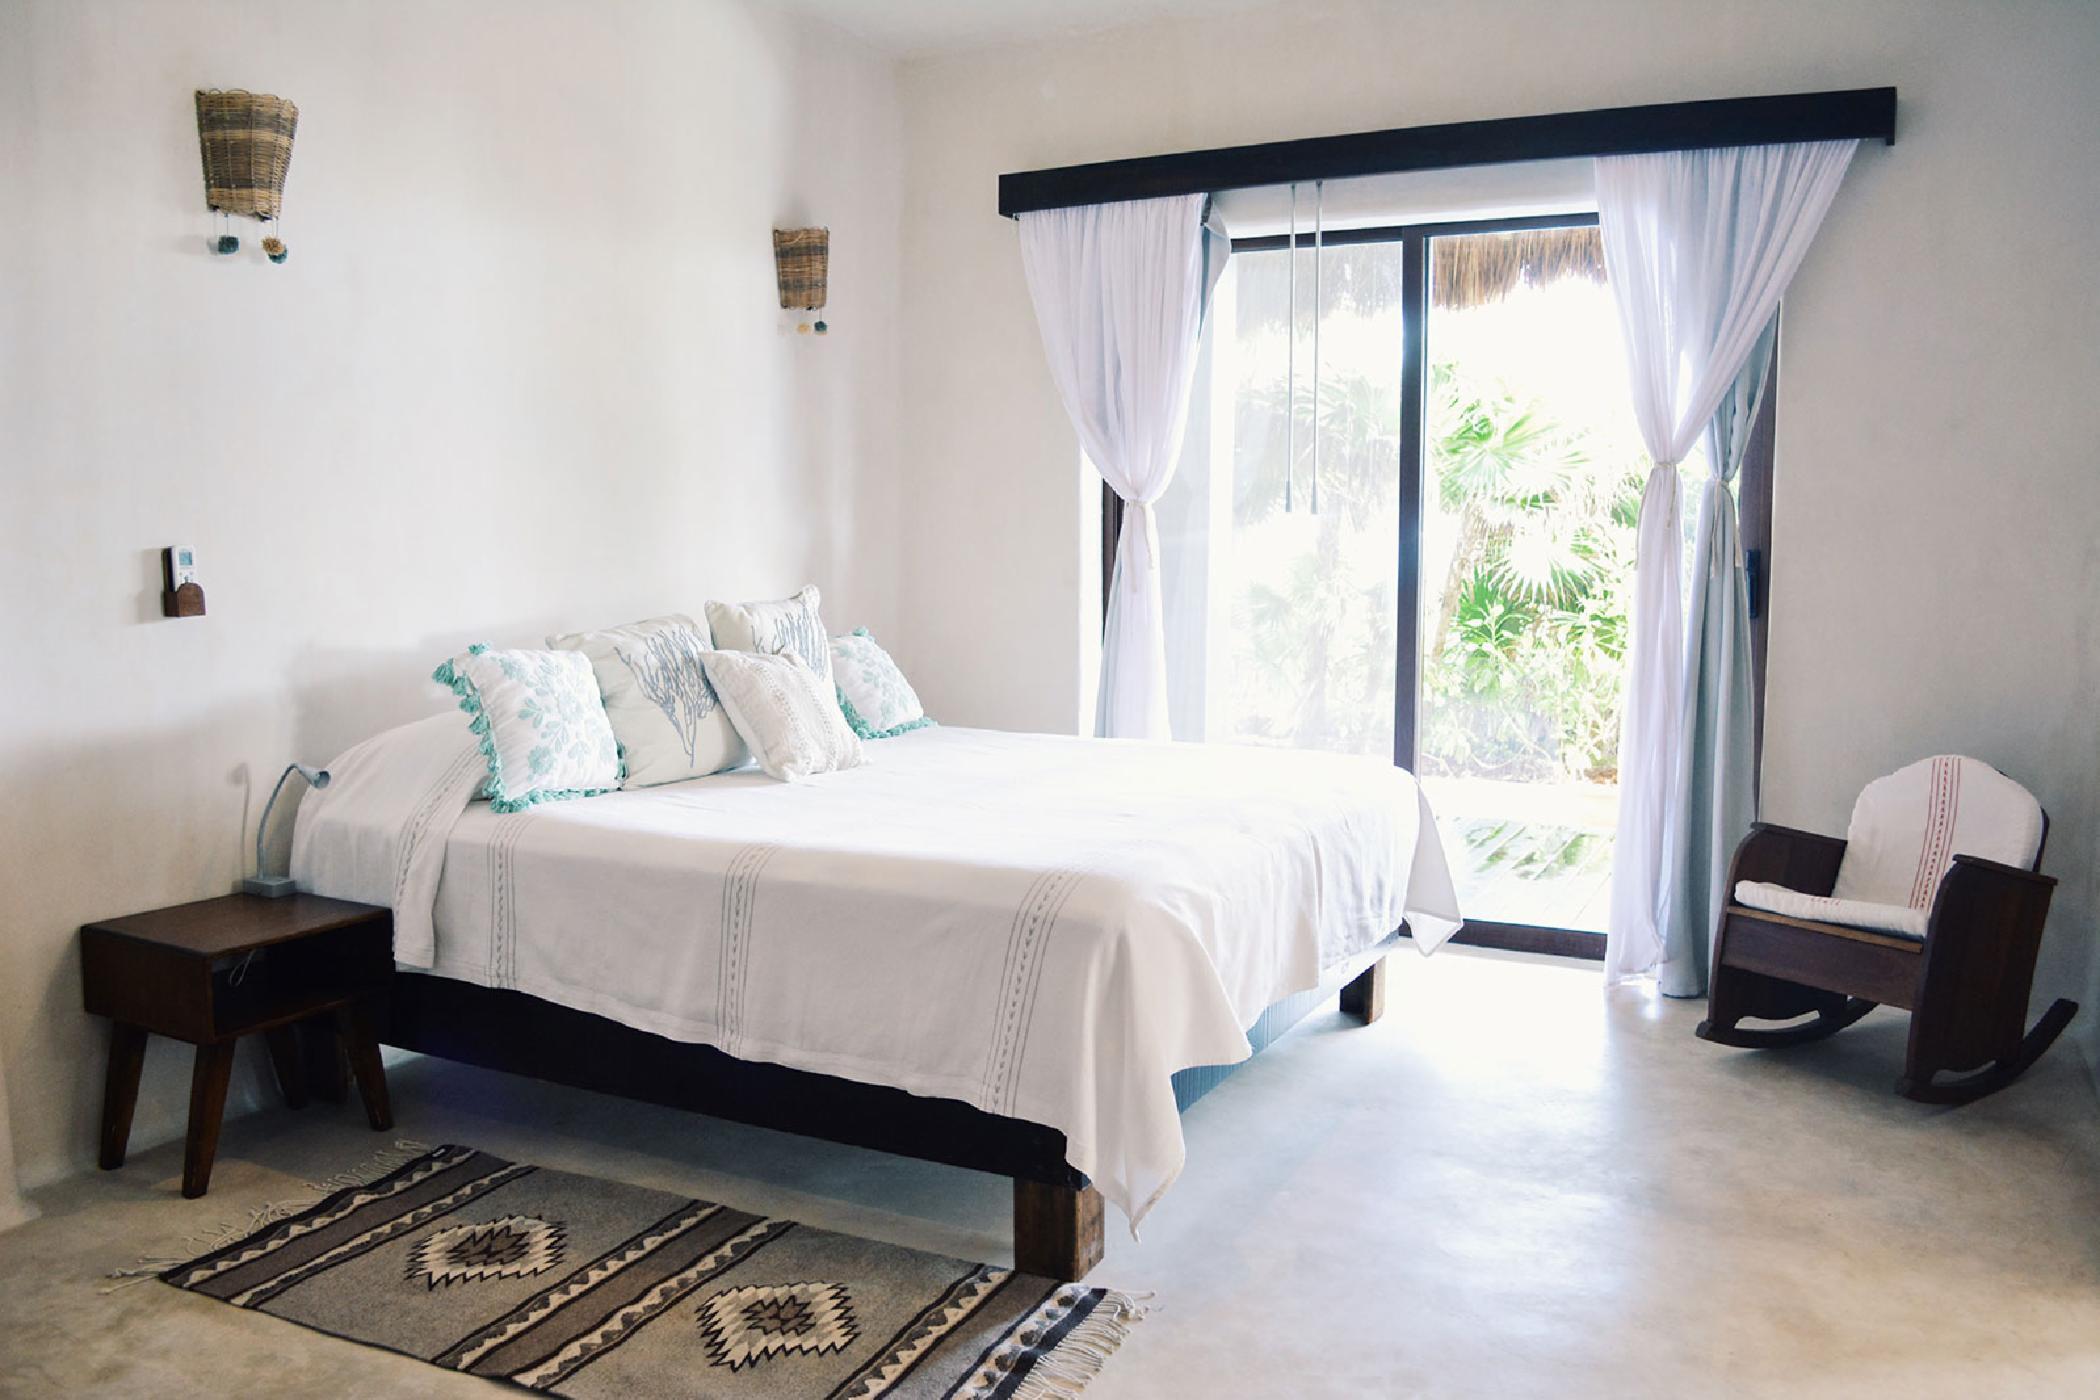 Maya_Luxe_Riviera_Maya_Luxury_Villas_Experiences_Hotel_Zone_Tulum_Beach_5_Bedrooms_Casa_Palapa_16.jpg